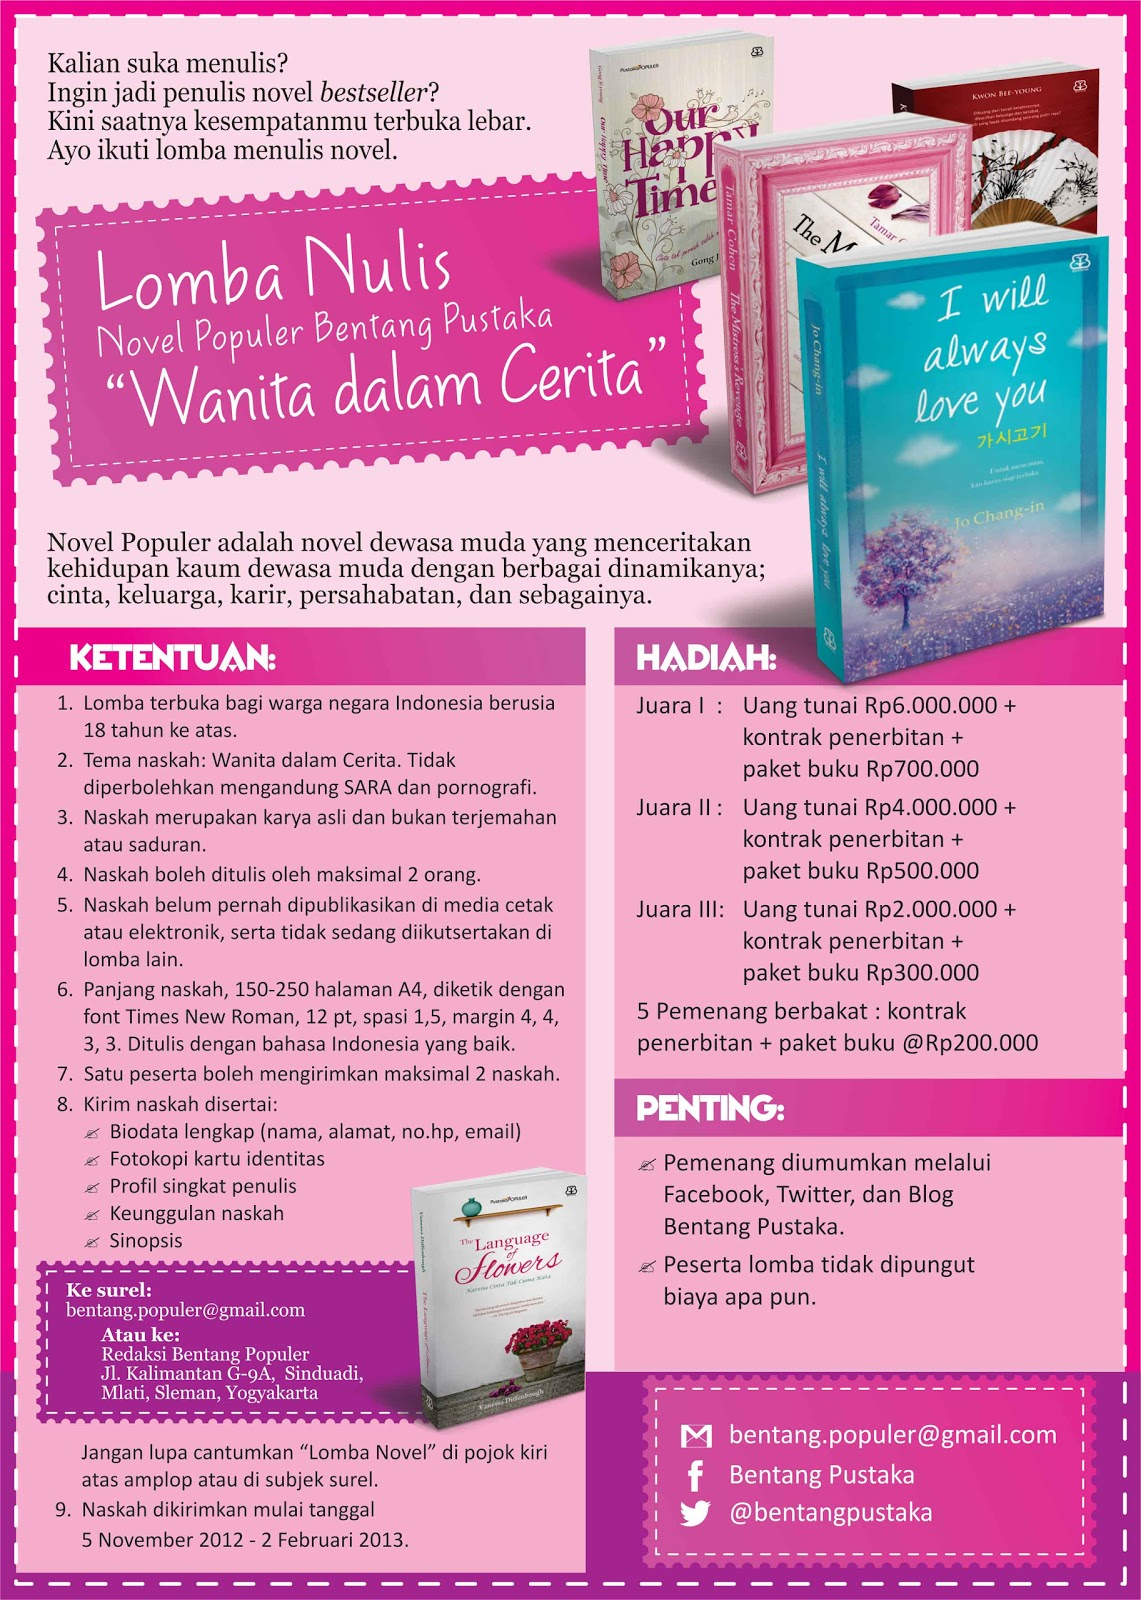 blogspot.com/2012/11/lomba-nulis-novel-populer-bentang.html?spref=fb